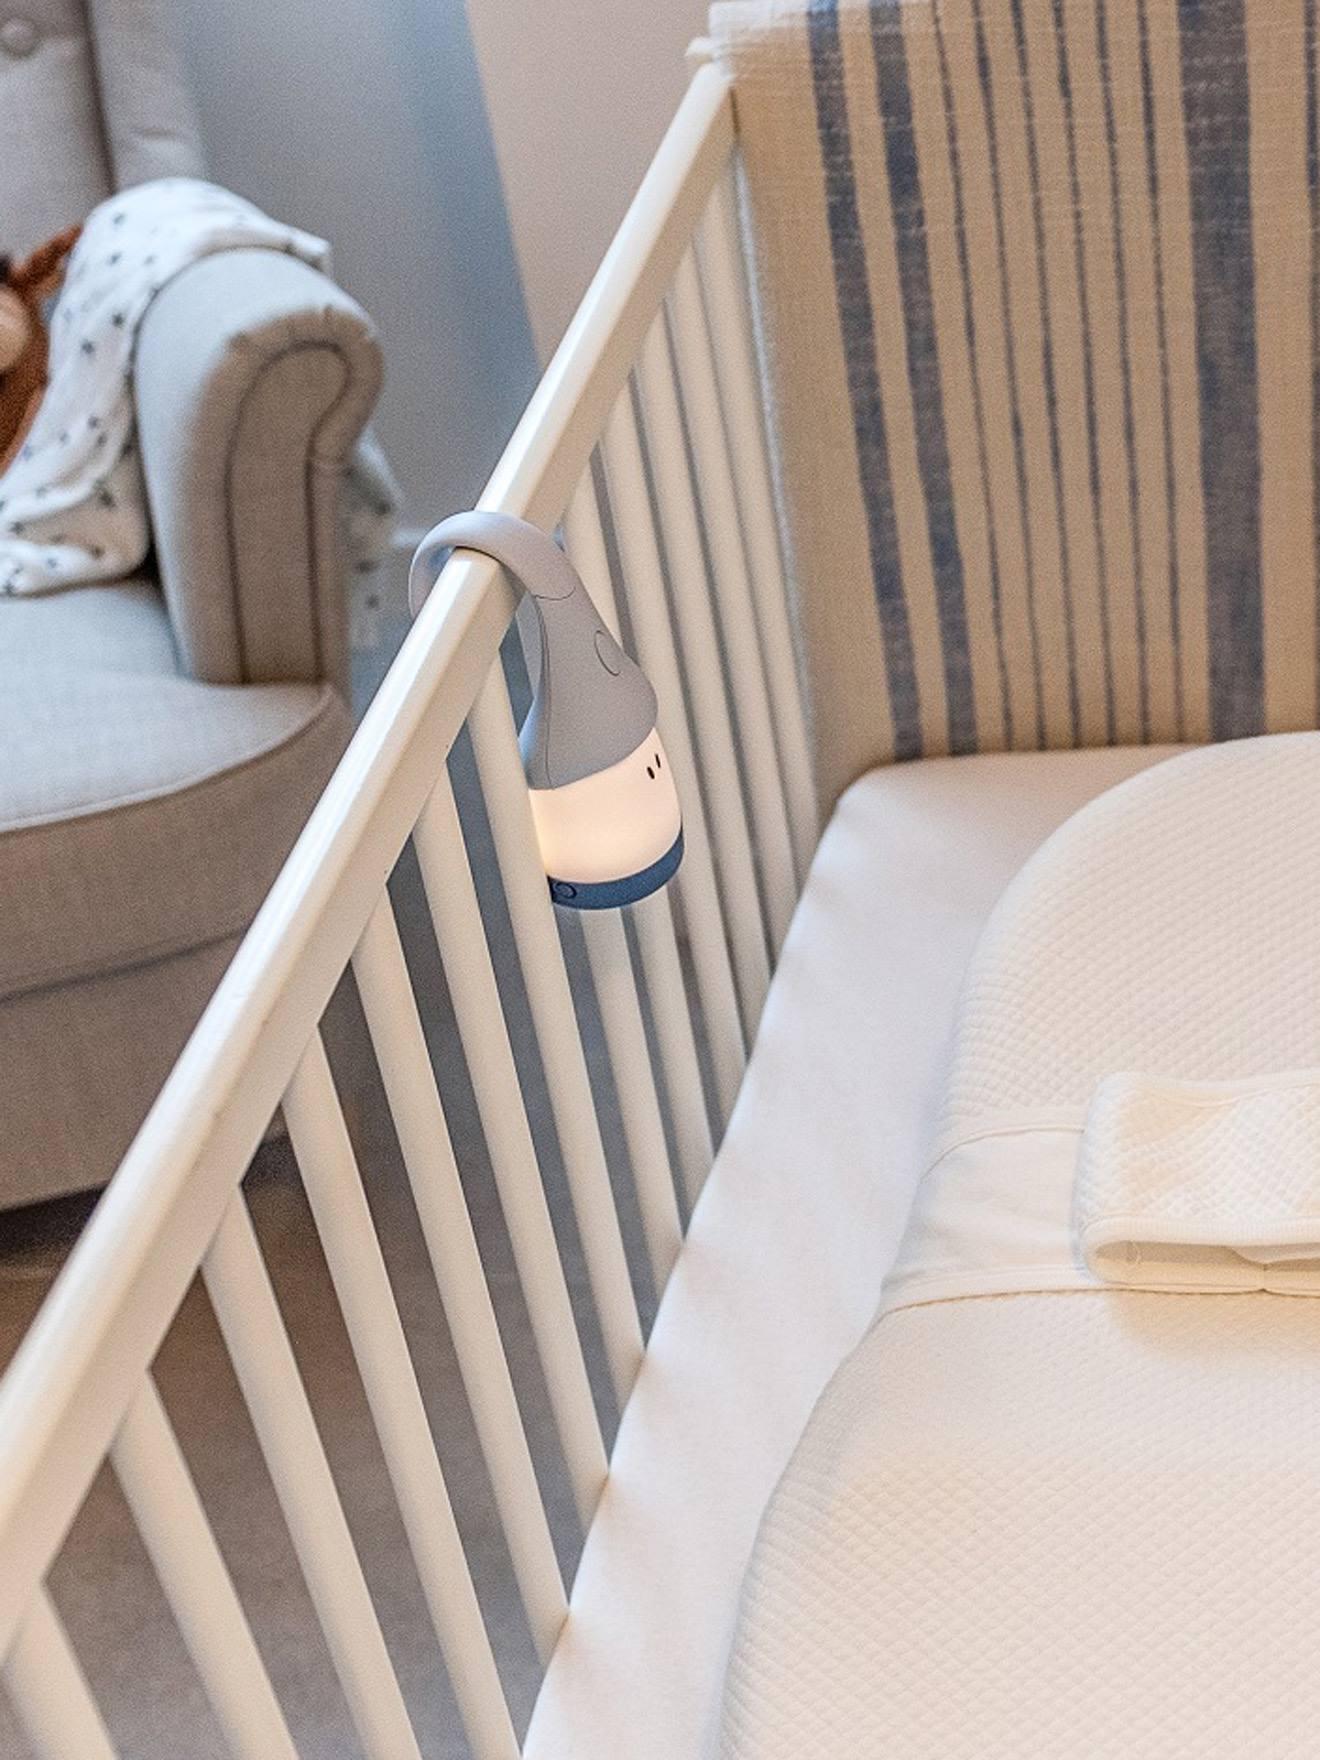 roba-kids NidoLil Planet nido de beb/é para la cuna cama rodeada para la cama de beb/é